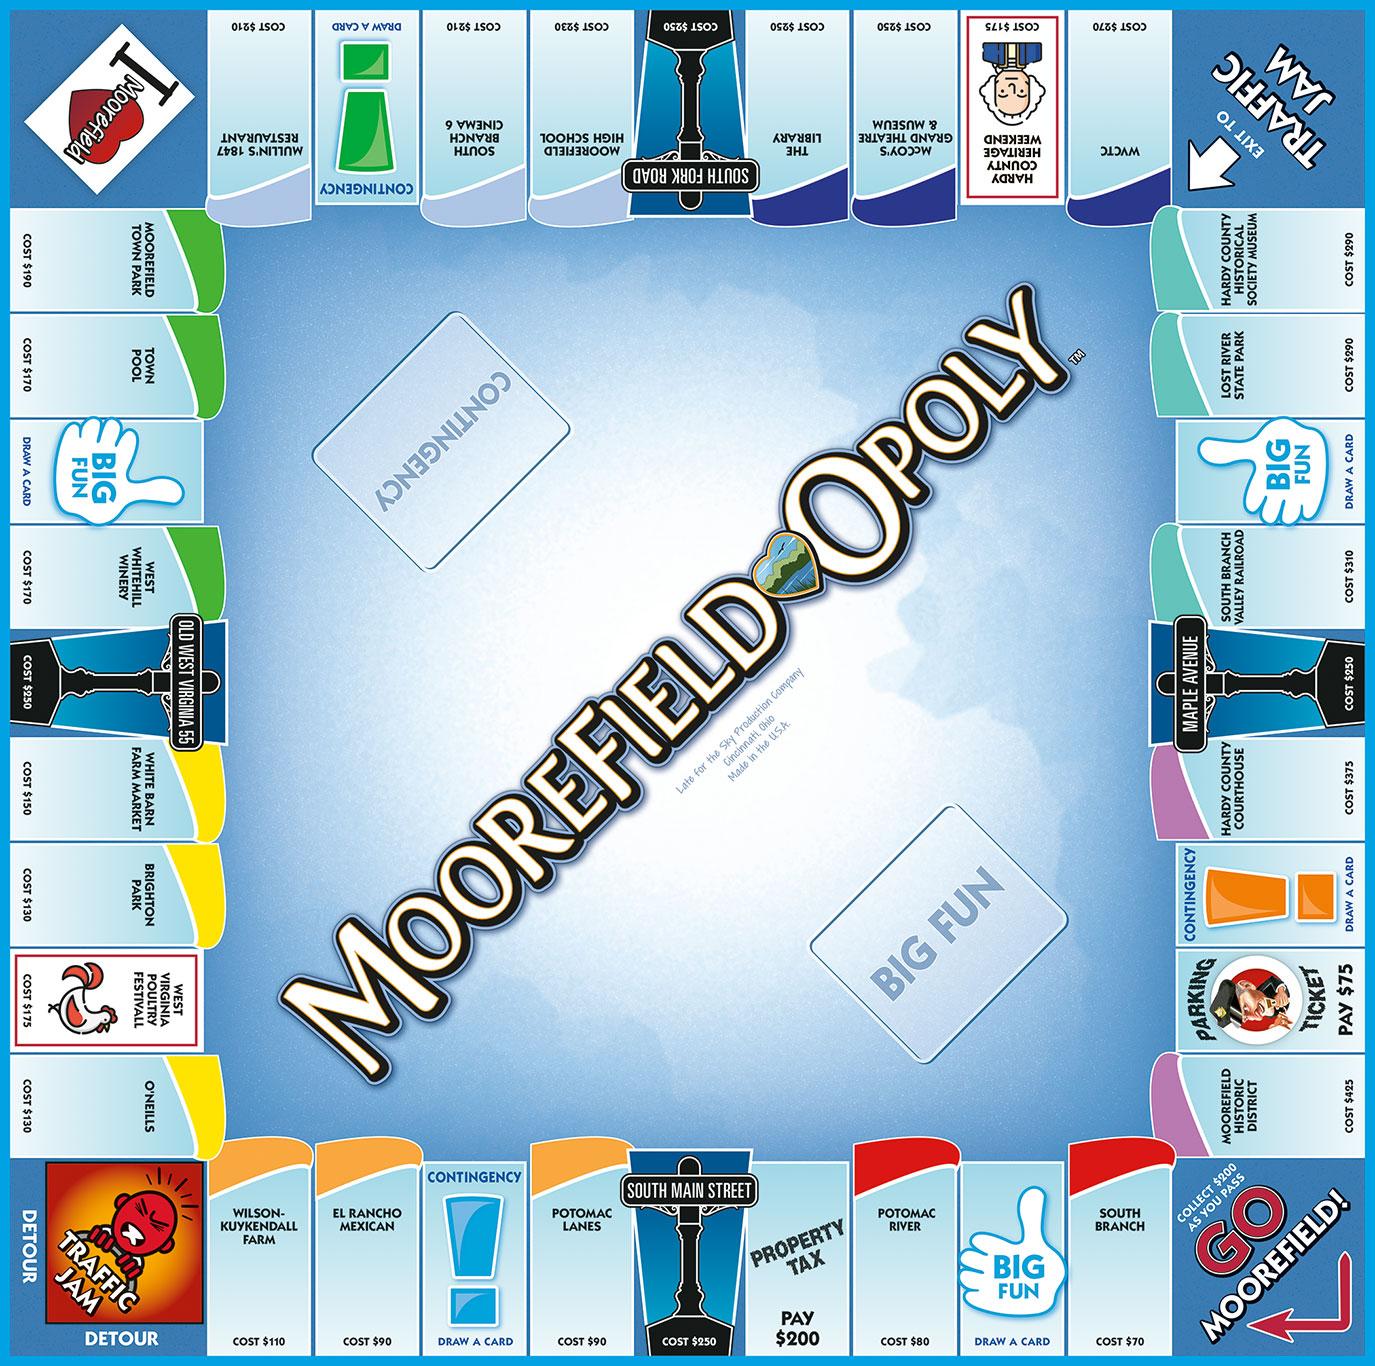 MOOREFIELD-OPOLY Board Game